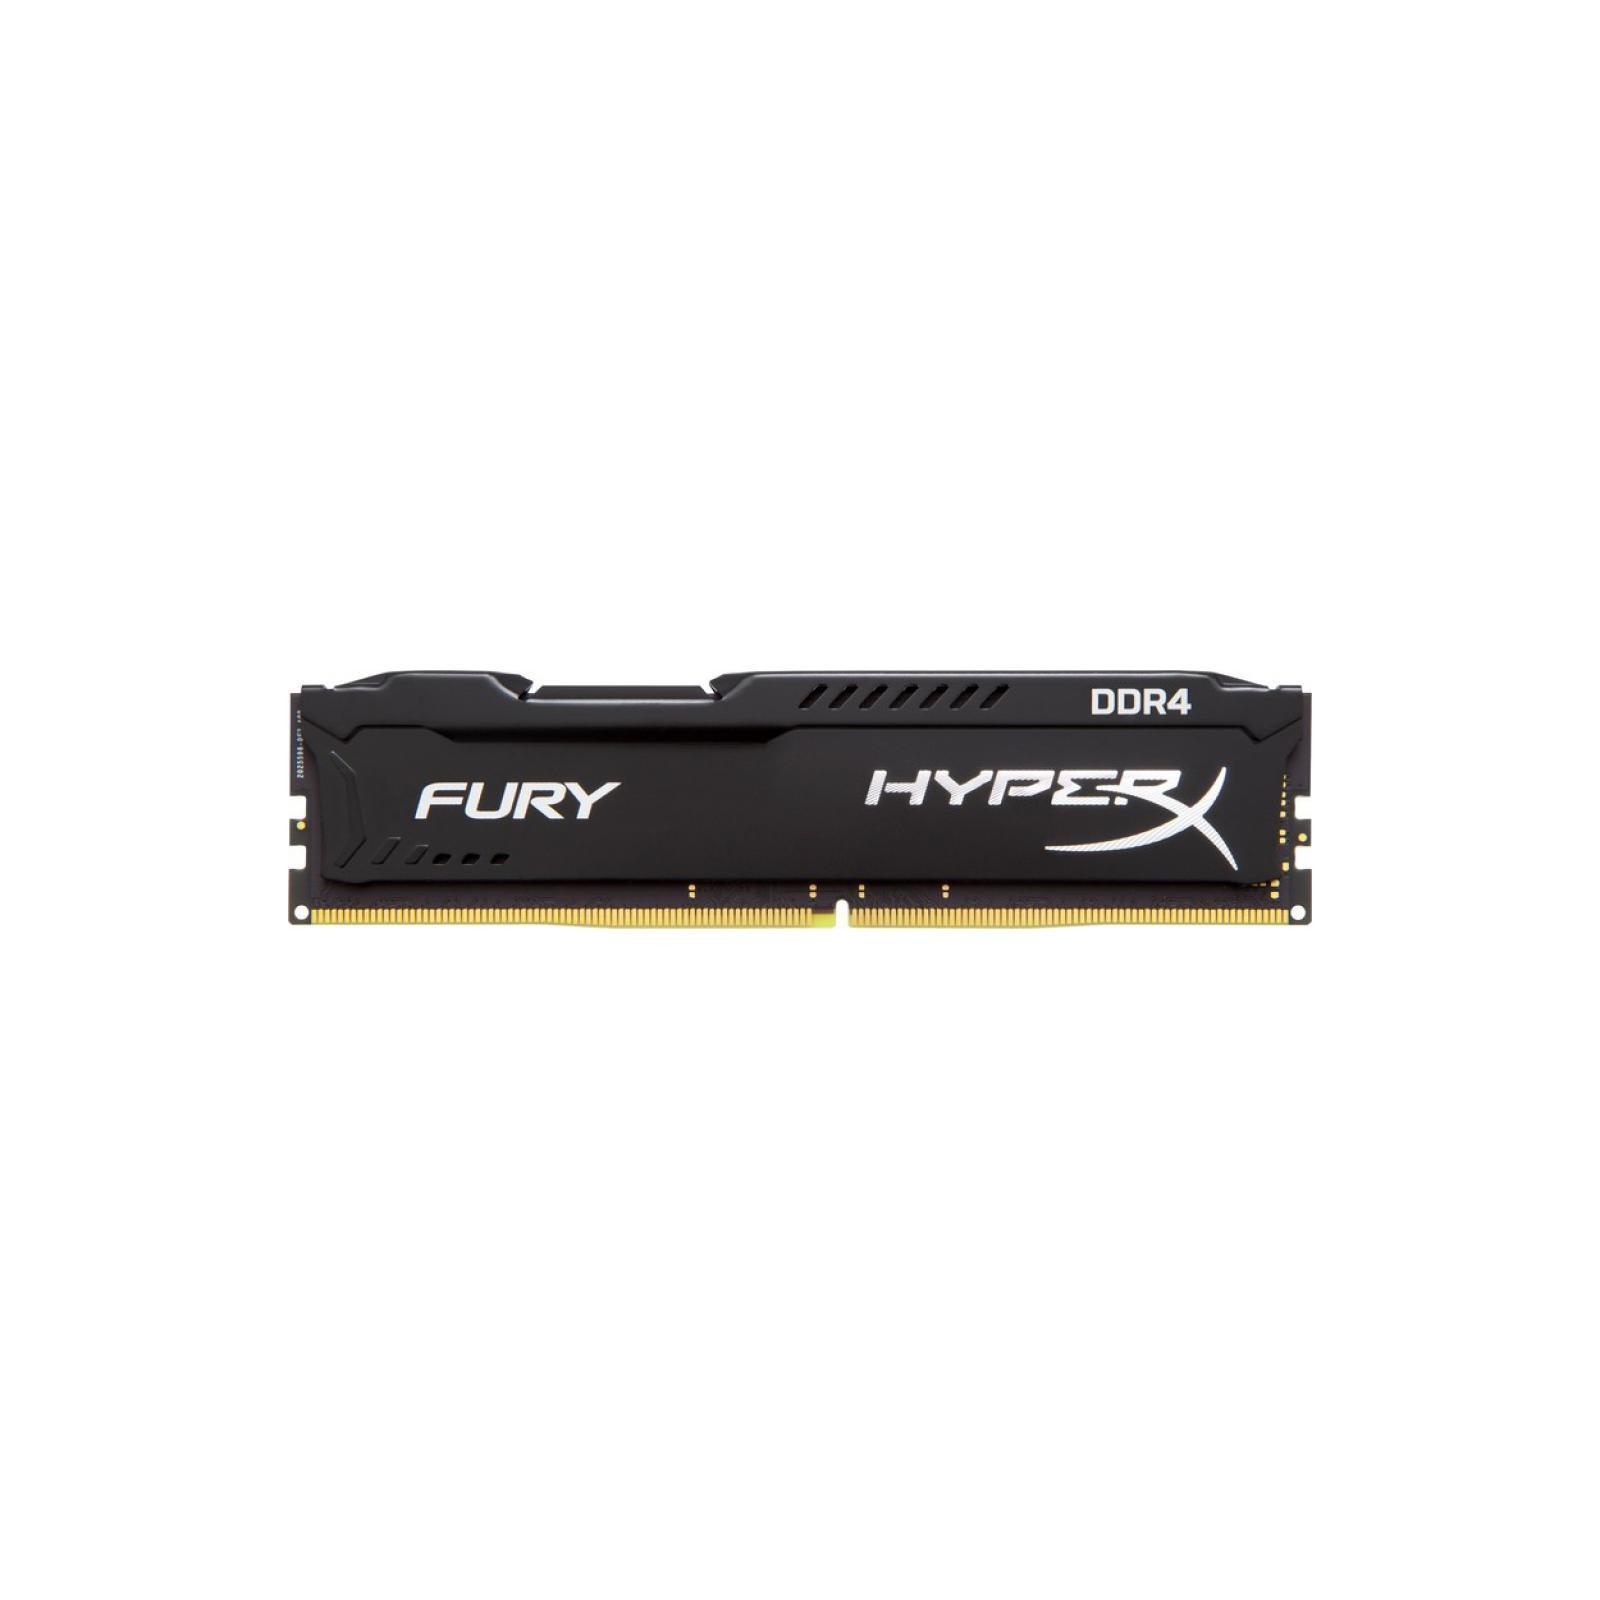 Модуль памяти для компьютера DDR4 16GB 2933 MHz HyperX FURY Black HyperX (Kingston Fury) (HX429C17FB/16)